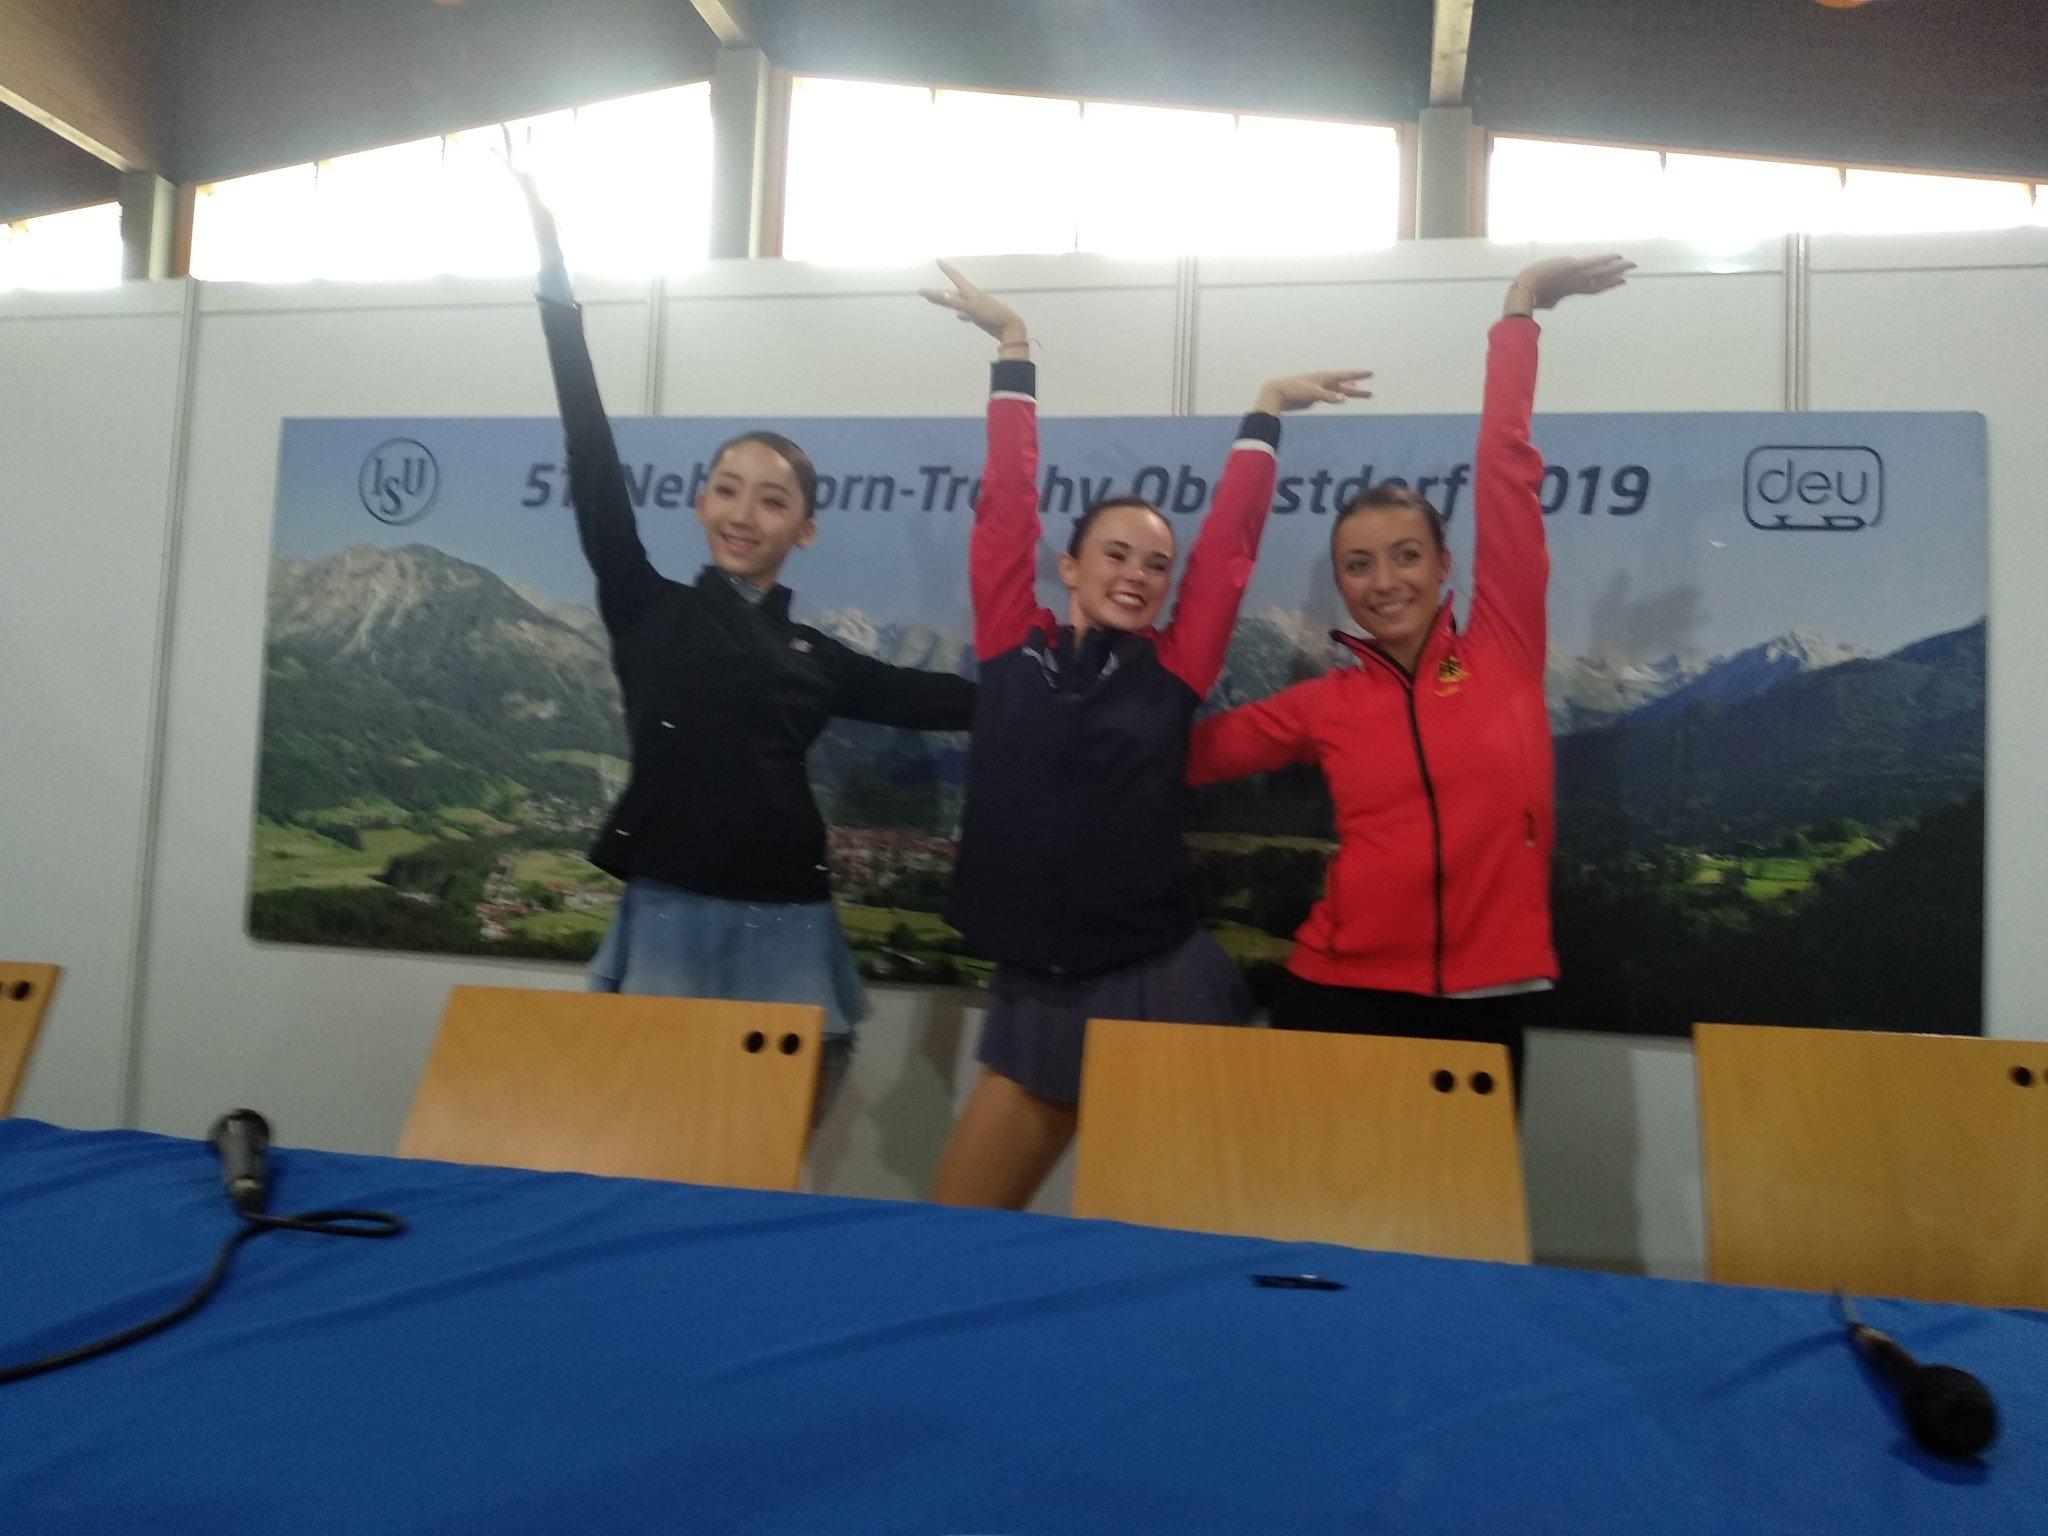 Challenger (5) - Nebelhorn Trophy 2019. 25 - 28 Sep 2019 Oberstdorf / GER - Страница 2 EFjRHDLWsAIUJw4?format=jpg&name=4096x4096